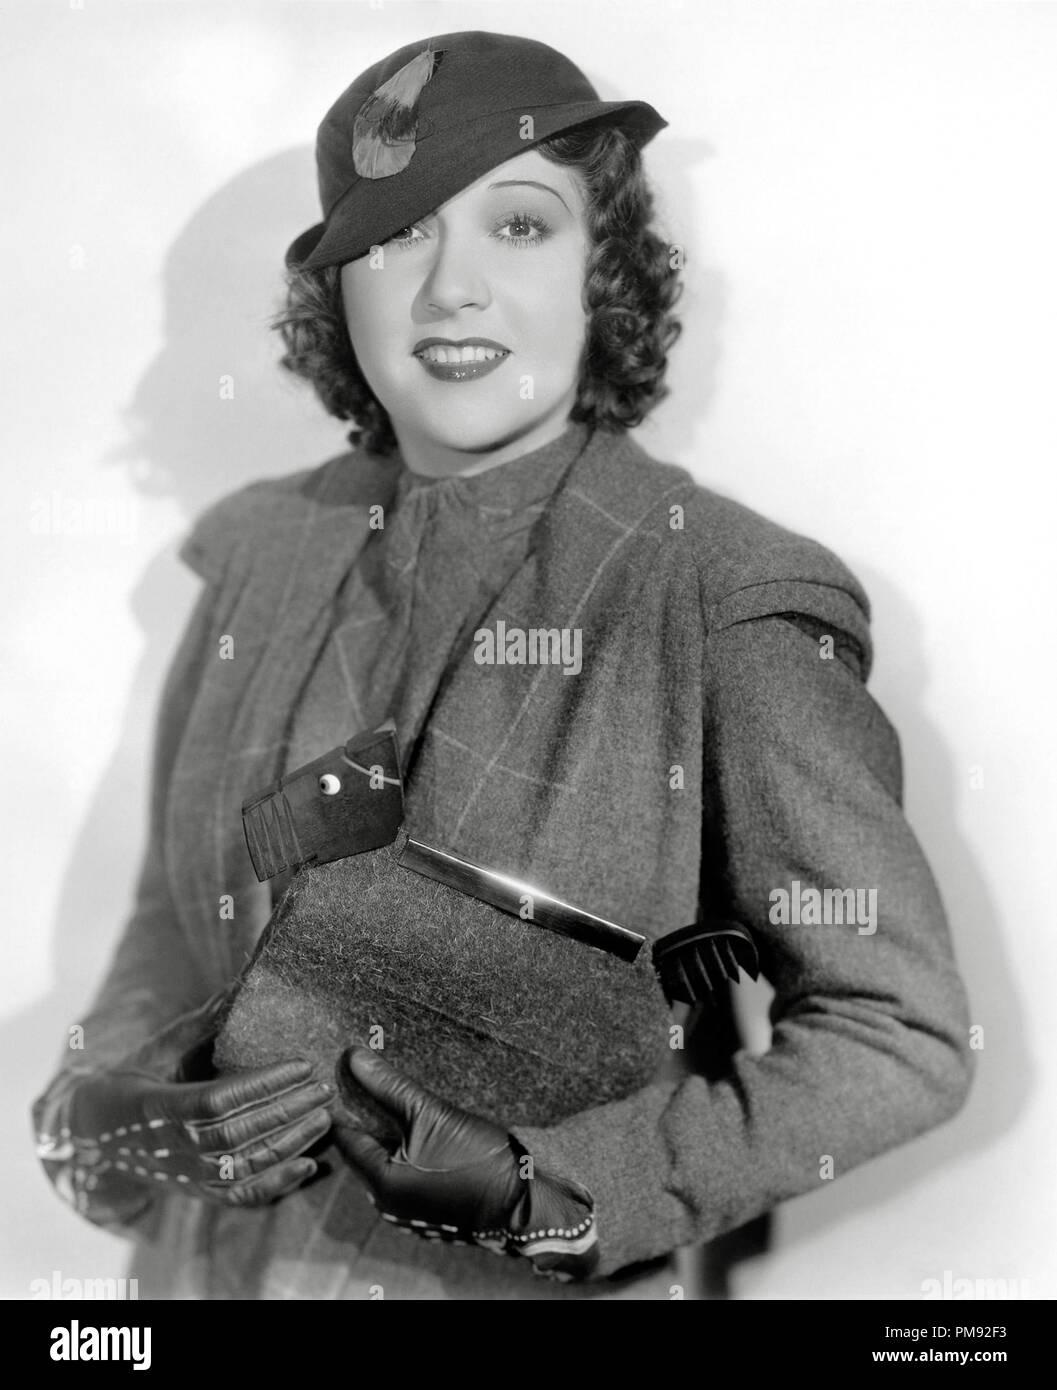 Ethel Merman Ethel Merman new pics